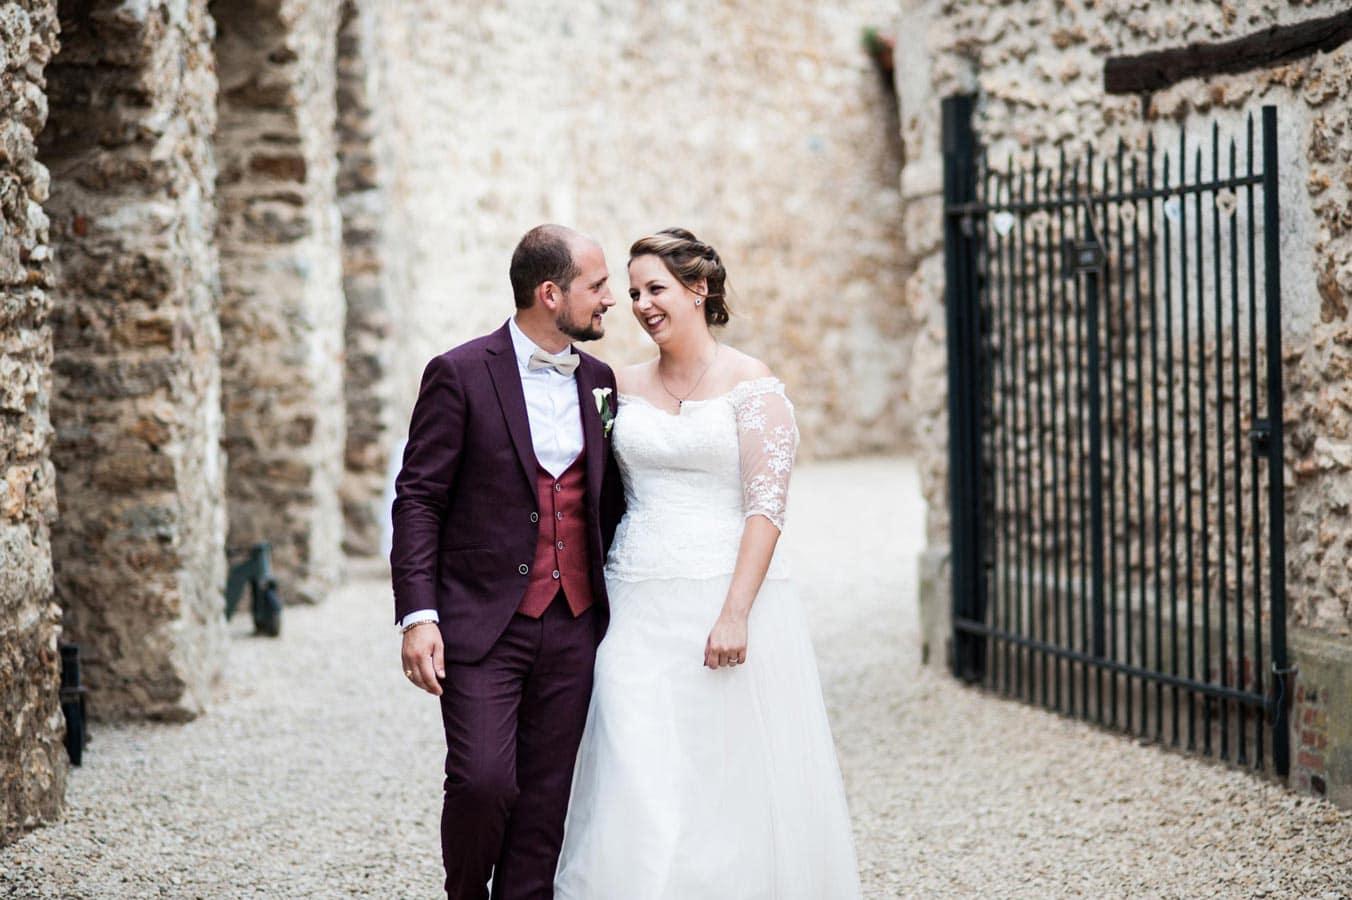 Galerie mariage de Floriane & Maxime